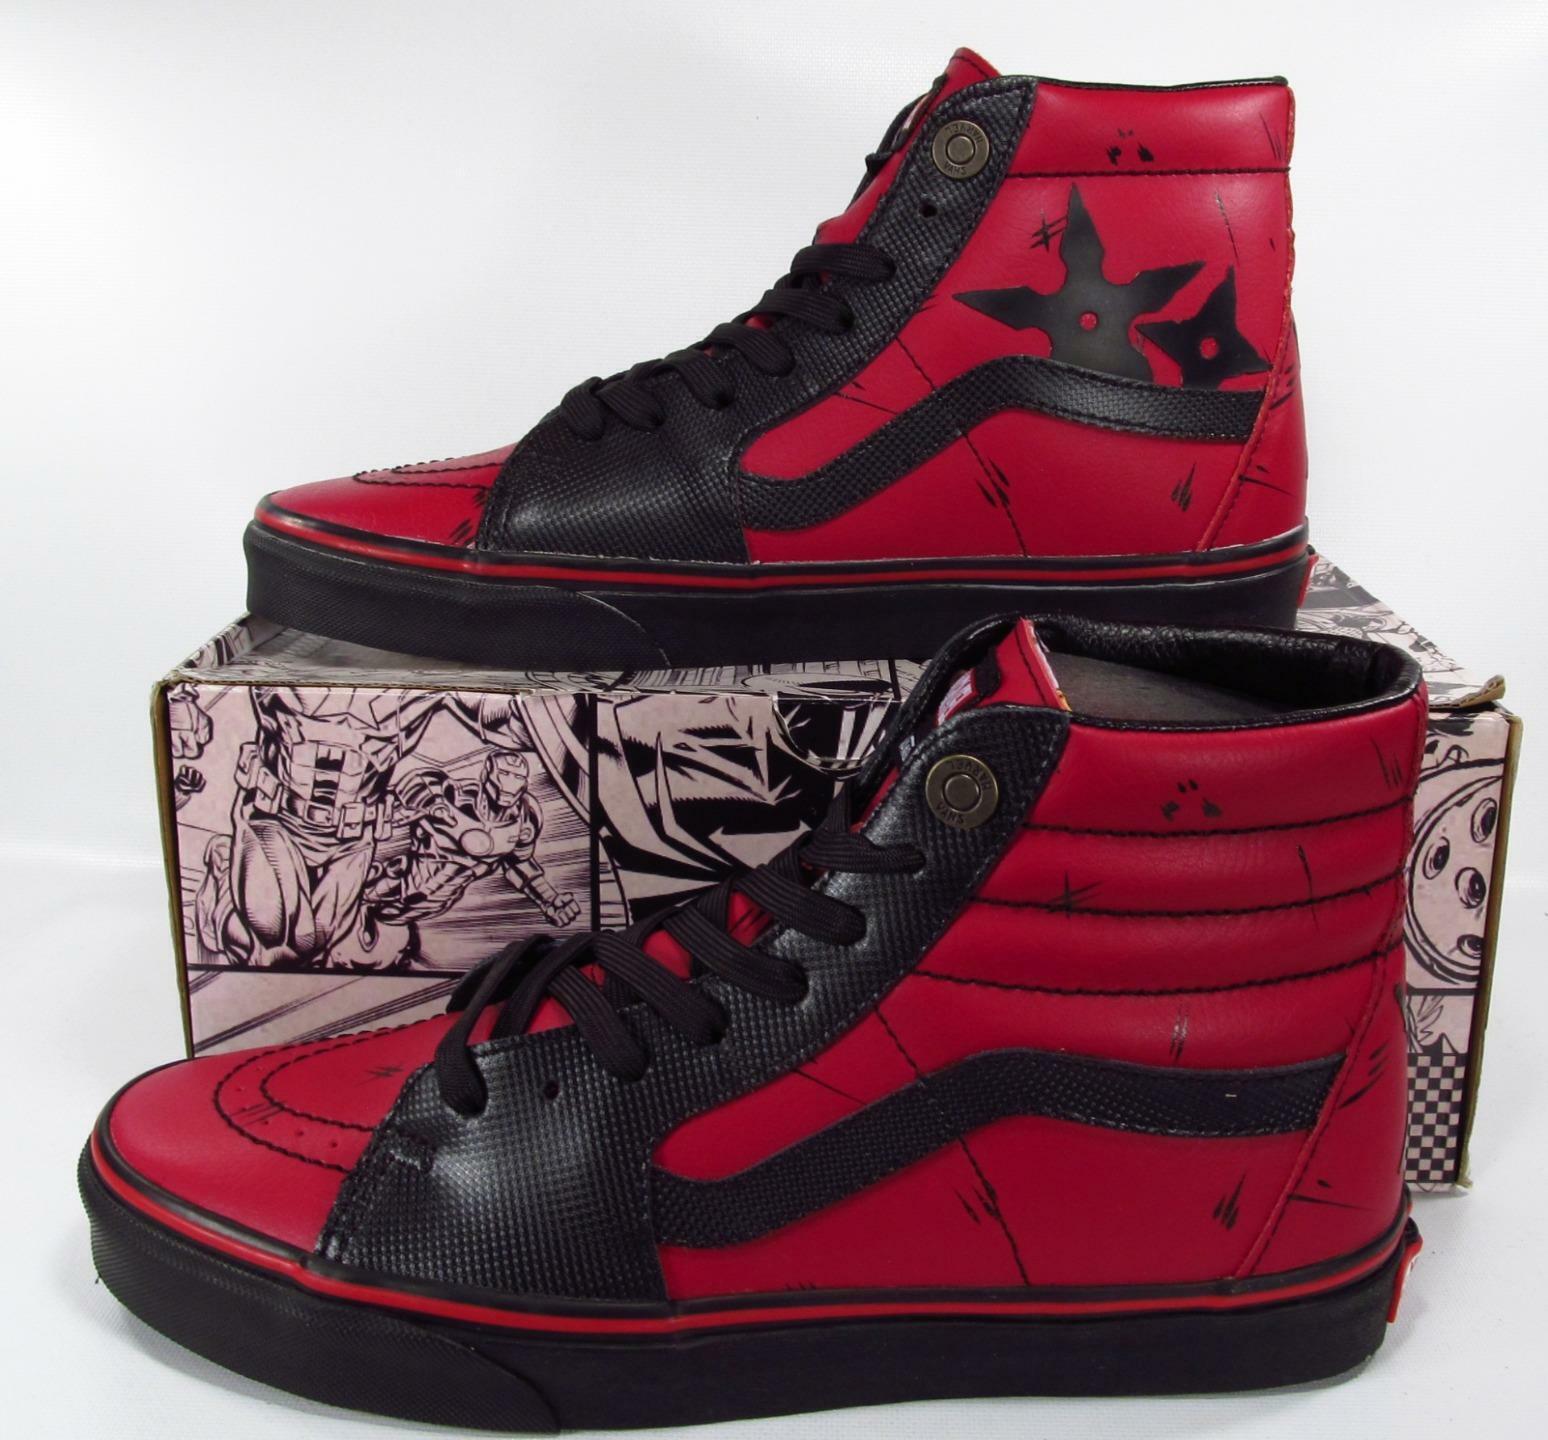 Vans Deadpool Dead Pool Sk8-Hi Leather - tiendamia.com